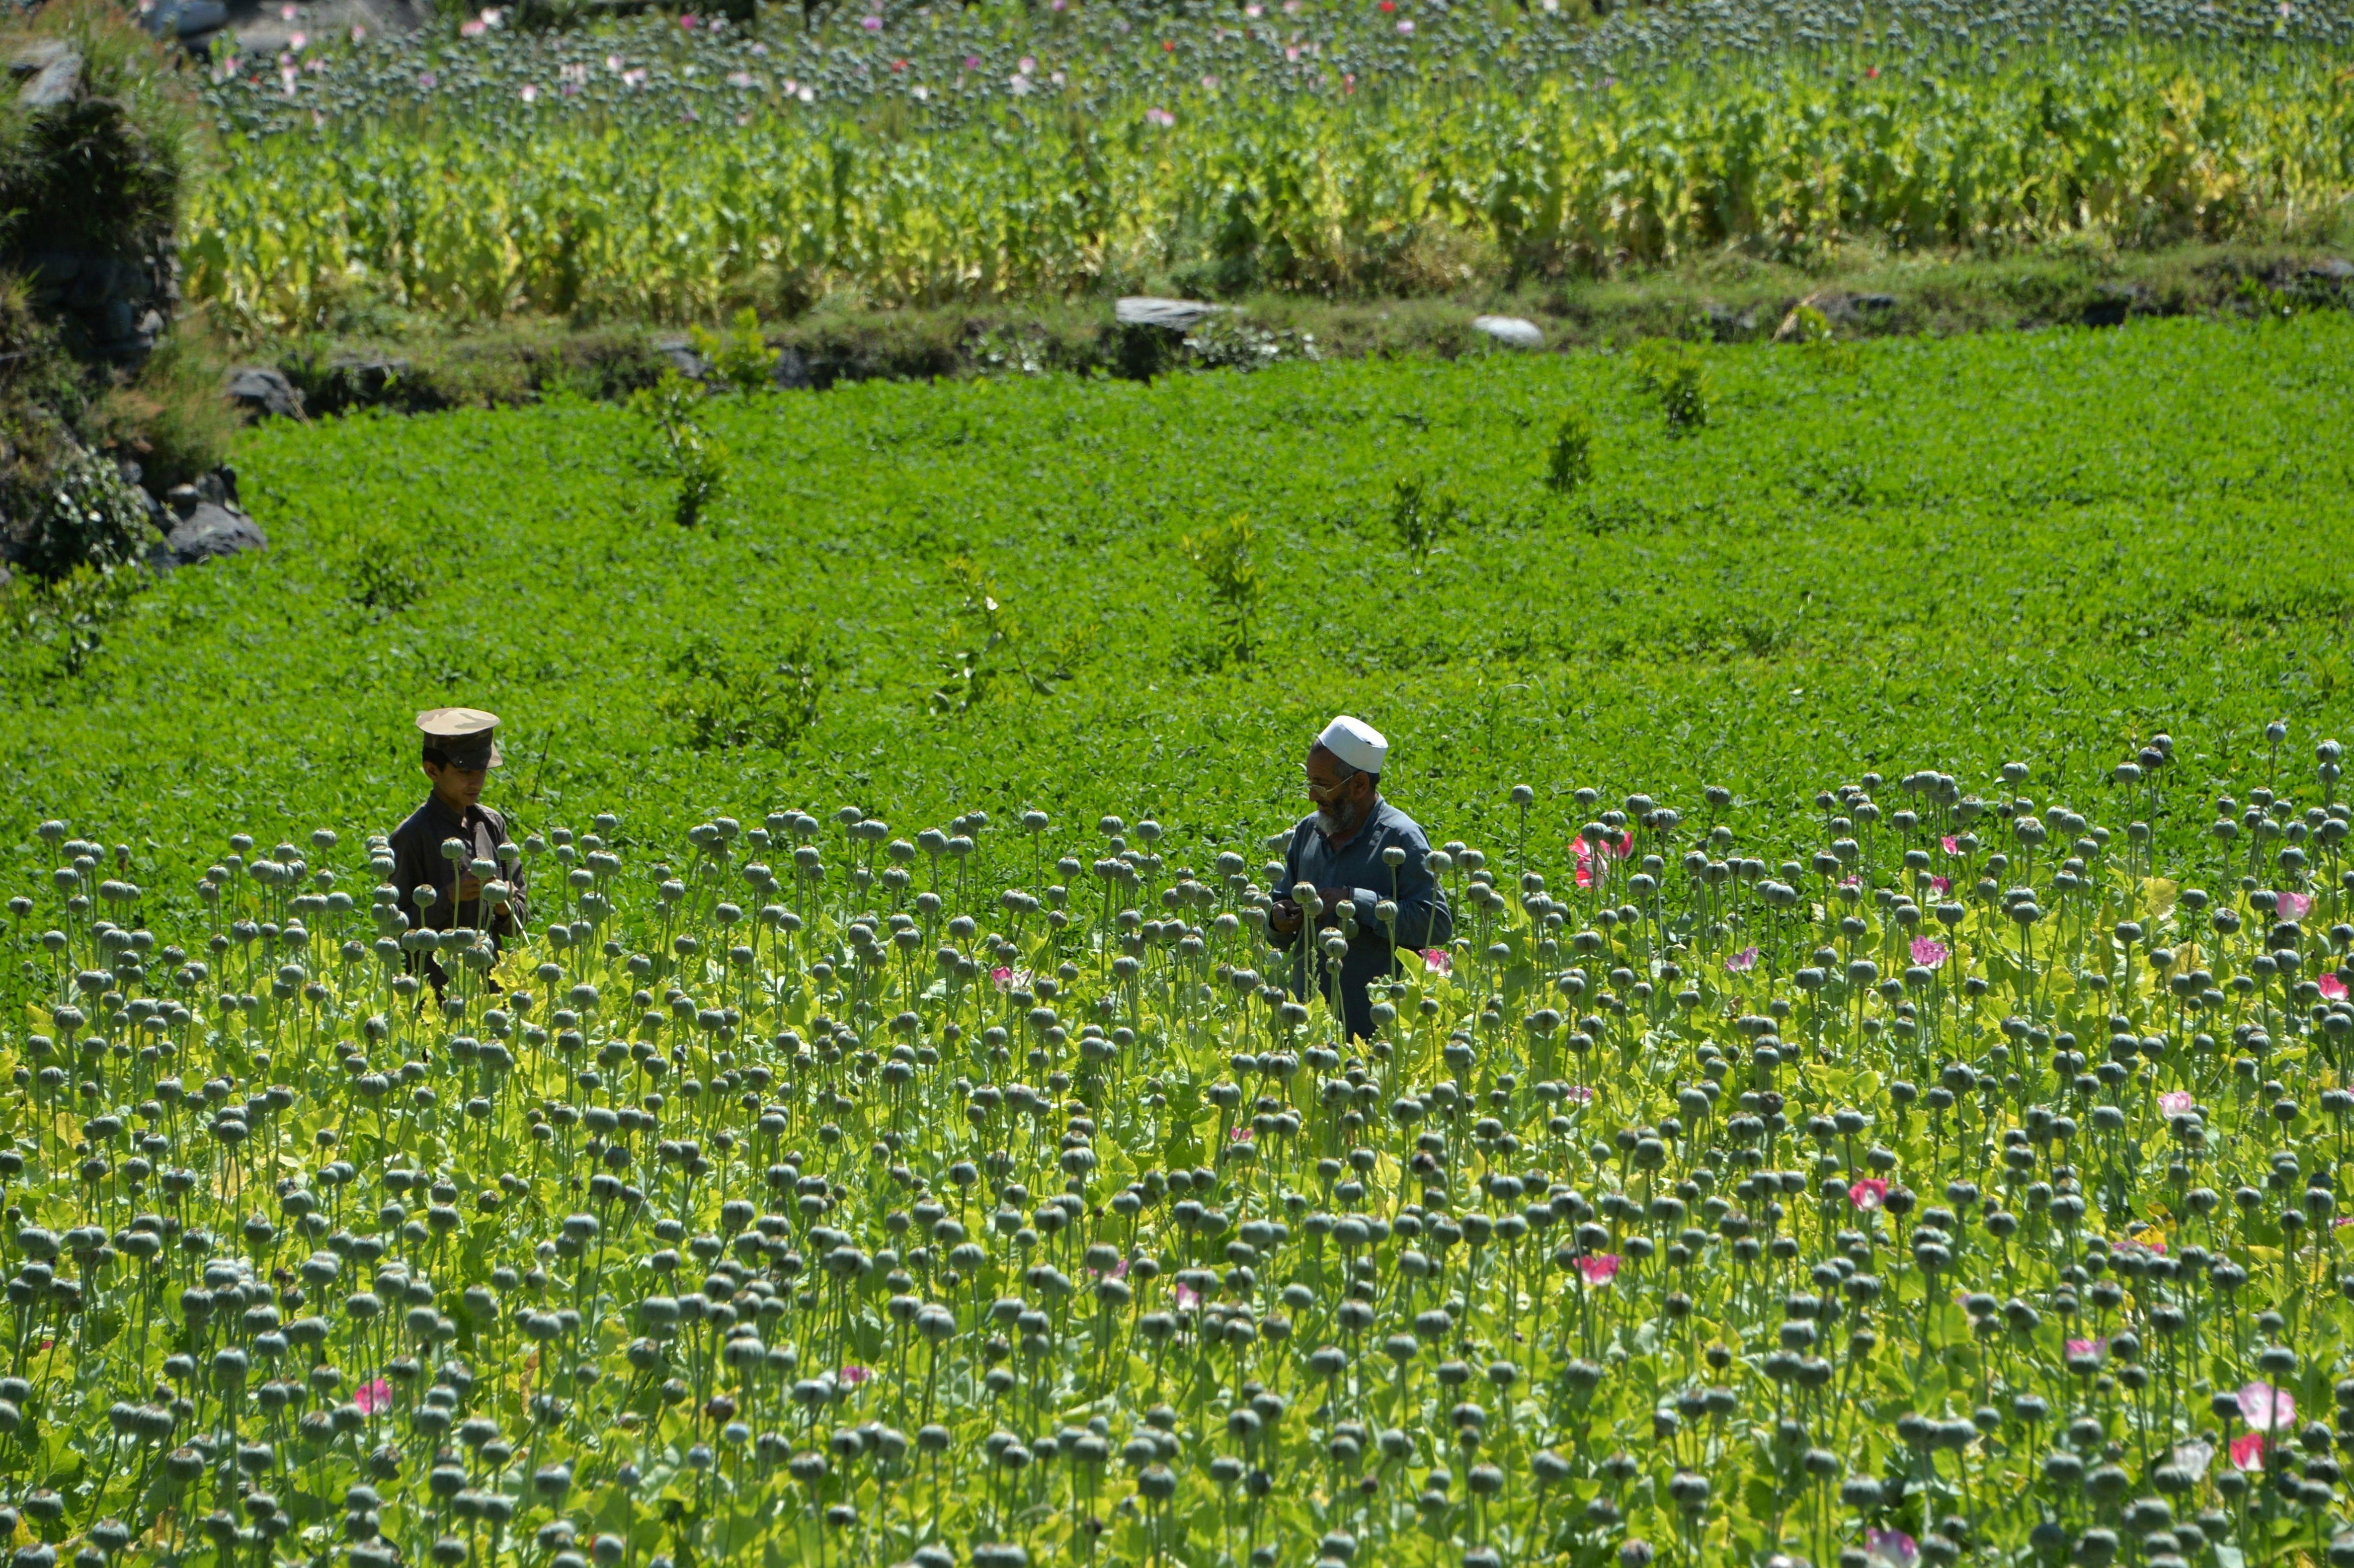 Farmers harvest opium sap from a poppy field